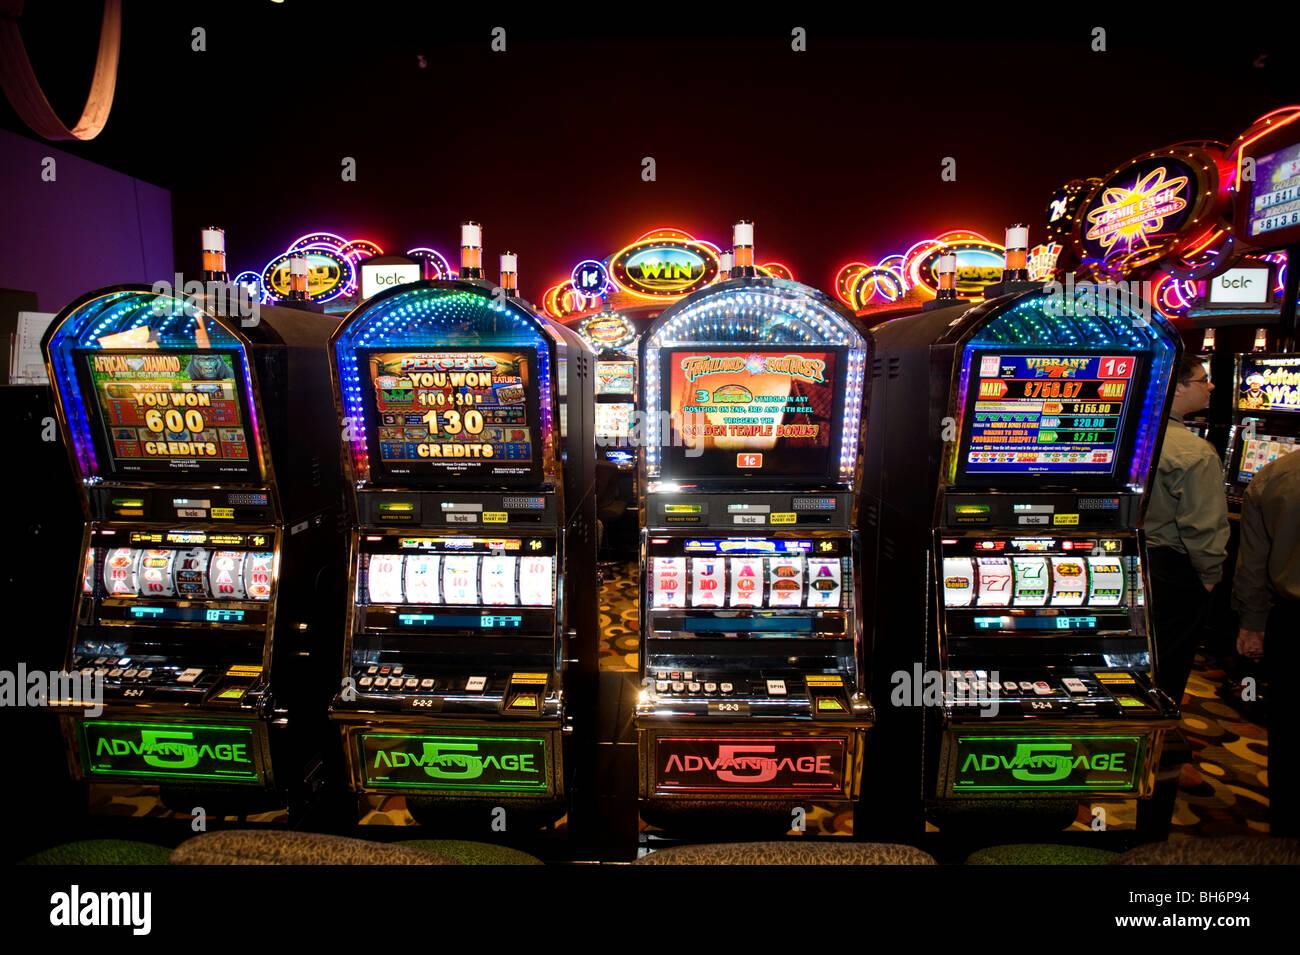 Slot machines at the Squamish Nation casino. - Stock Image